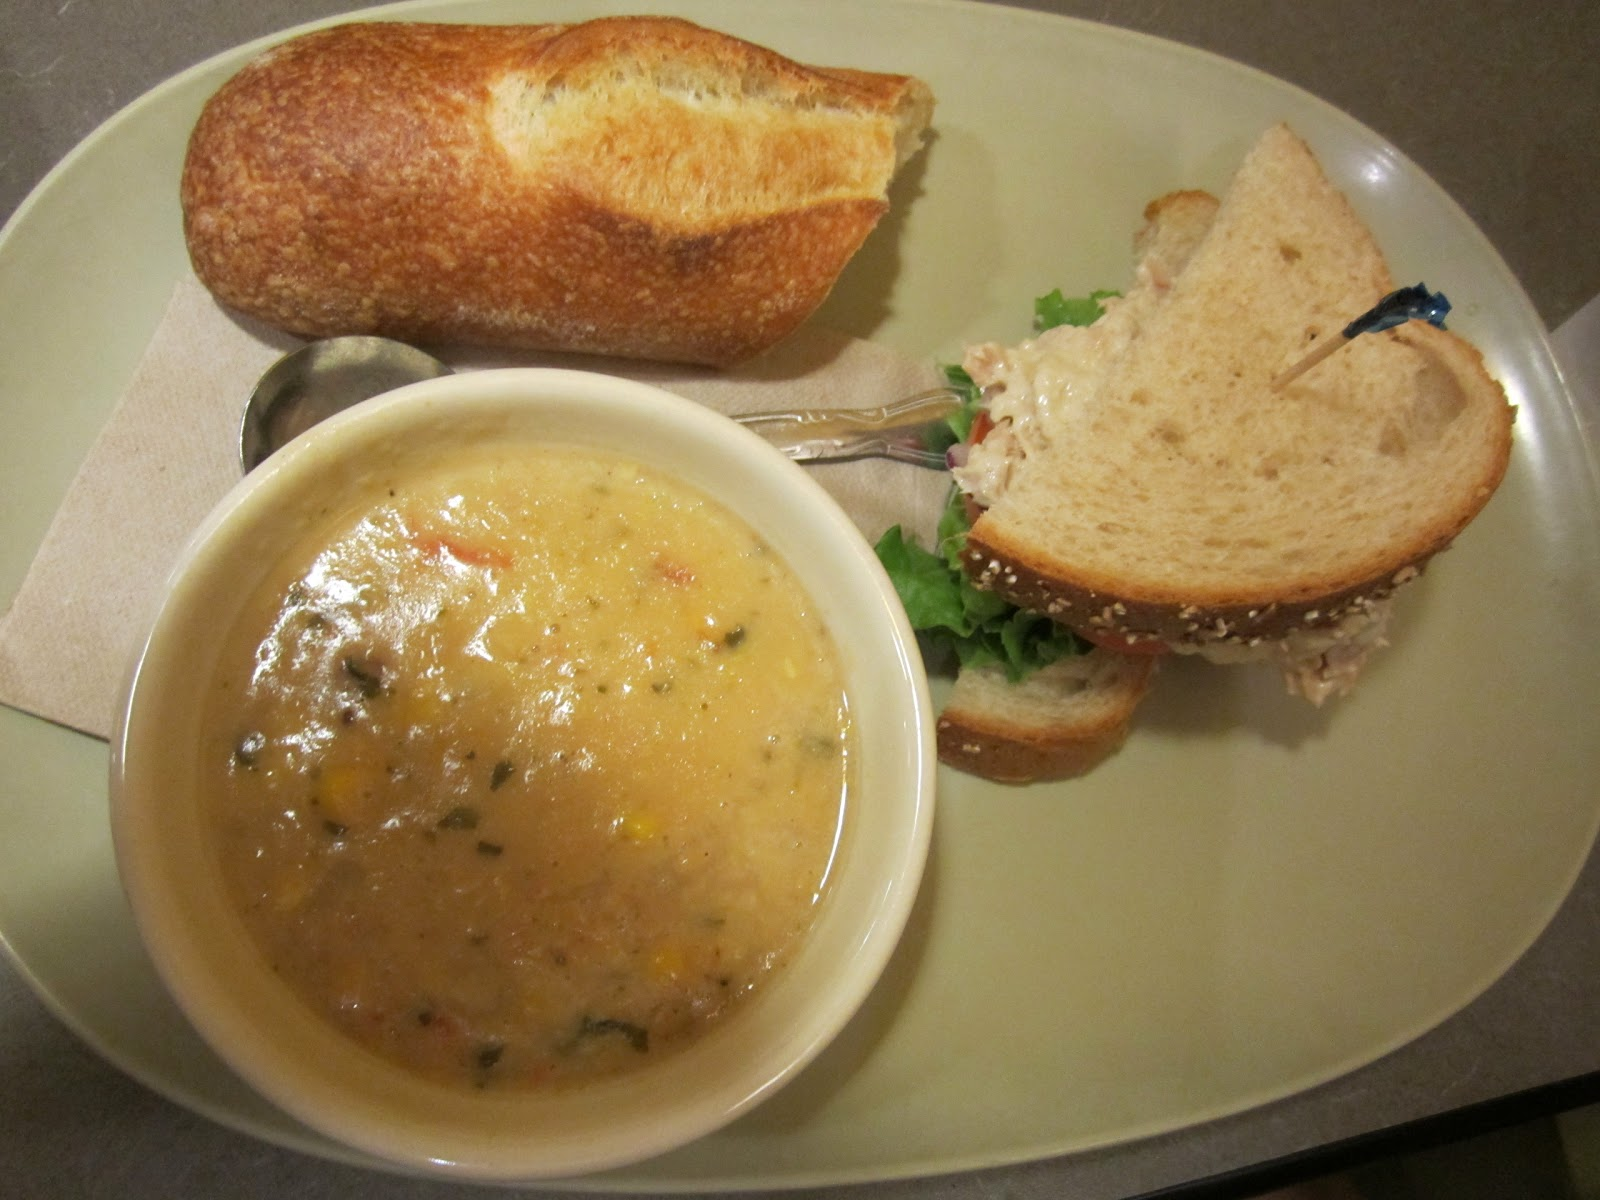 Panera Bread Restaurant Copycat Recipes: Summer Corn Chowder